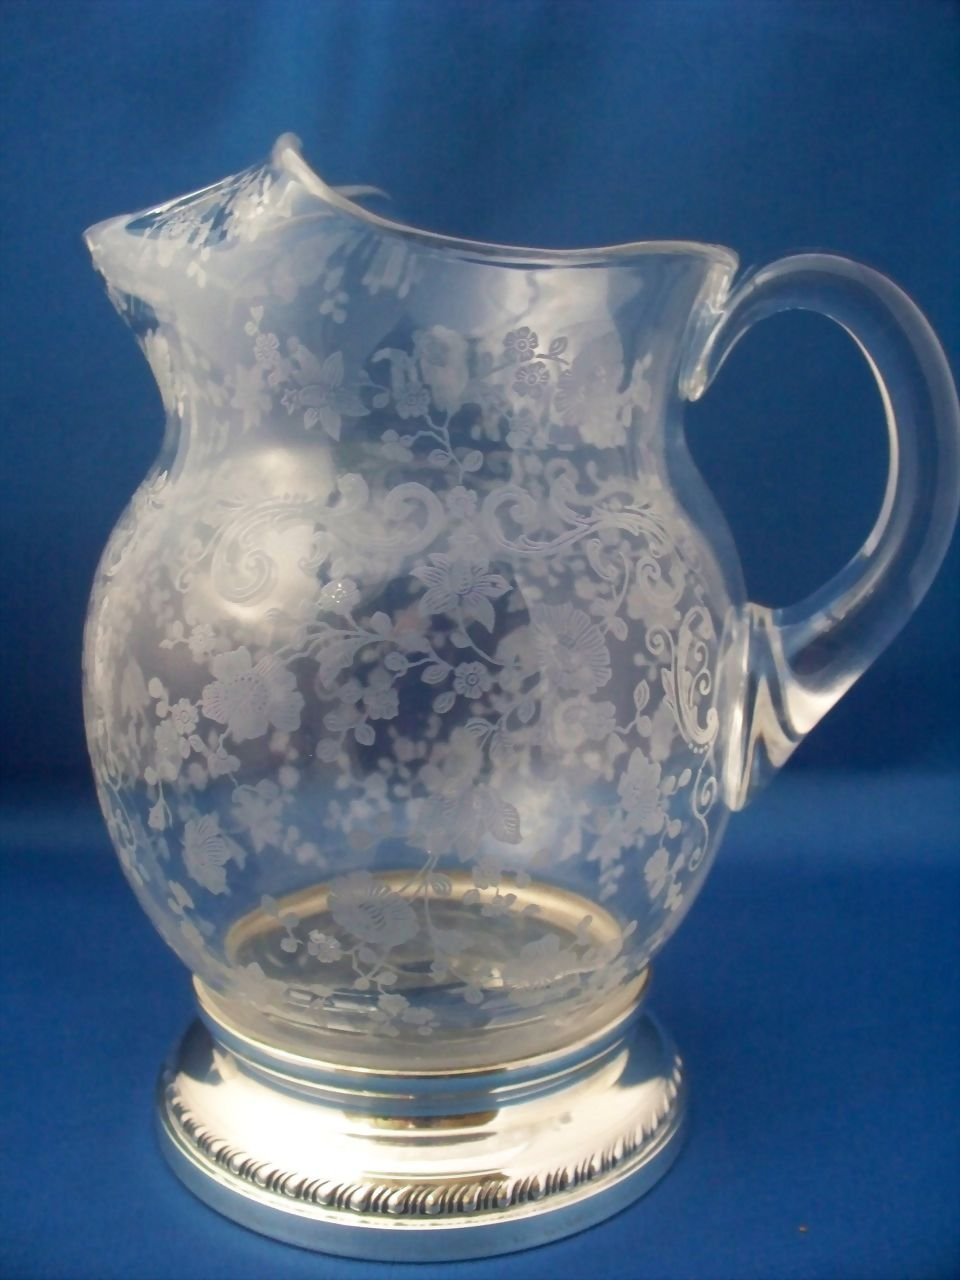 Cambridge Glass Company